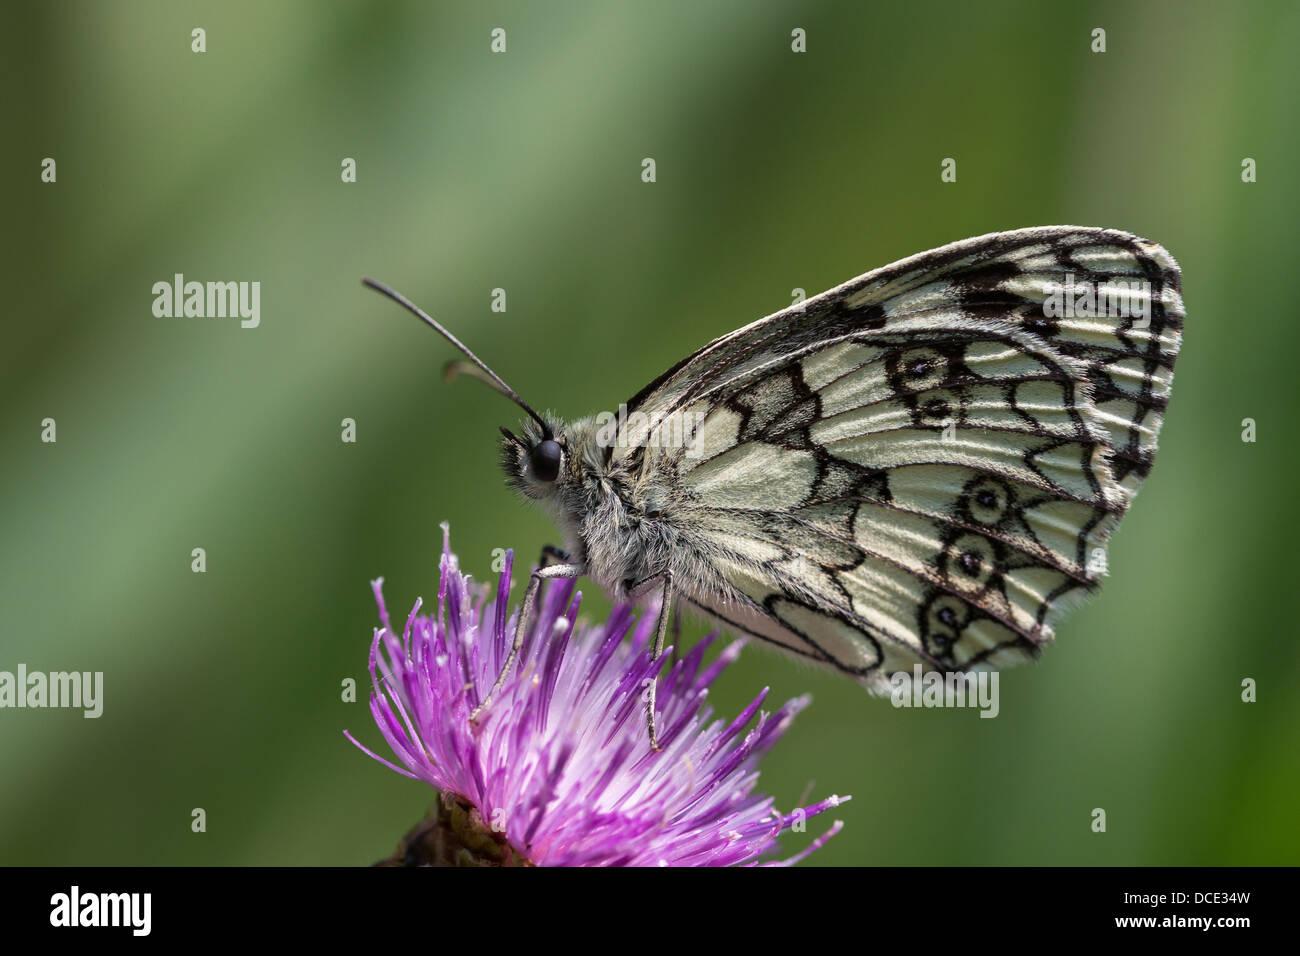 Marbled White butterfly (Melanargia galathea) feeding on knapweed - Stock Image